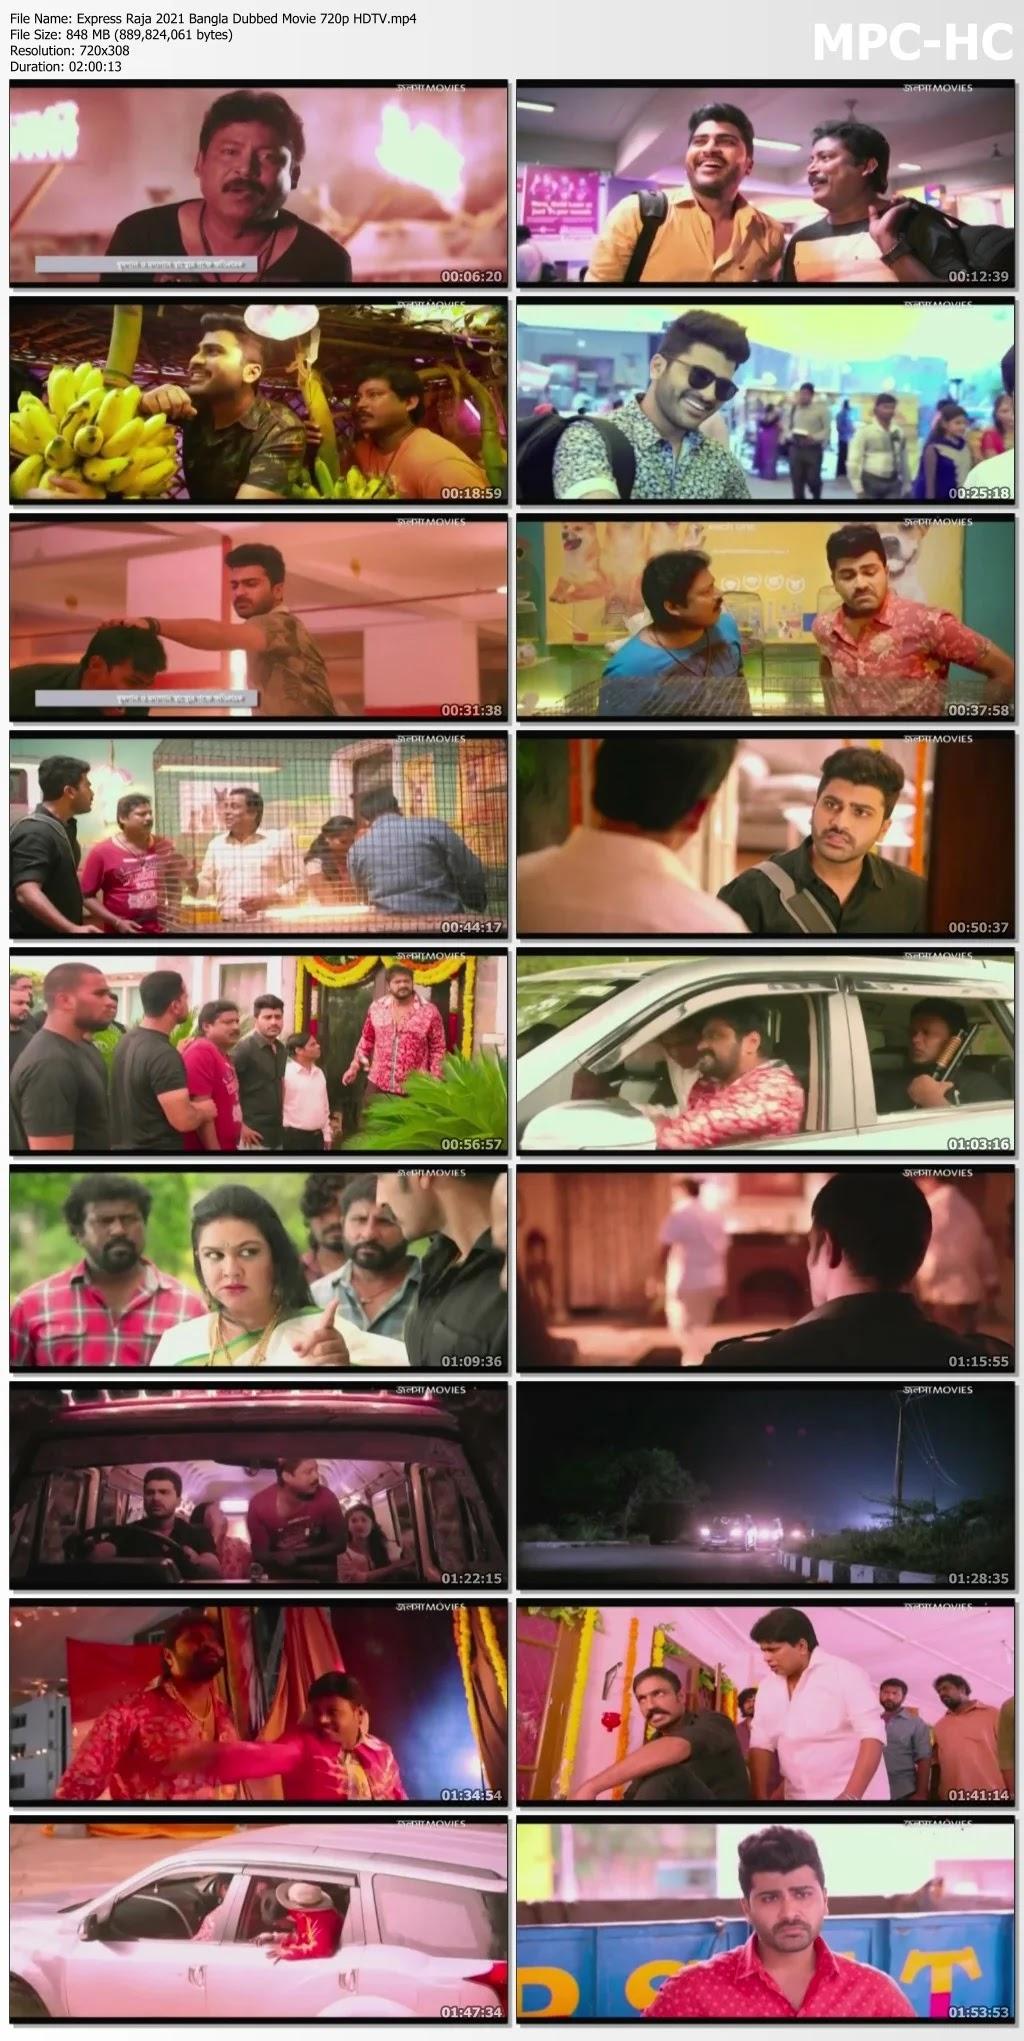 Express Raja Full Movie Download in Hindi